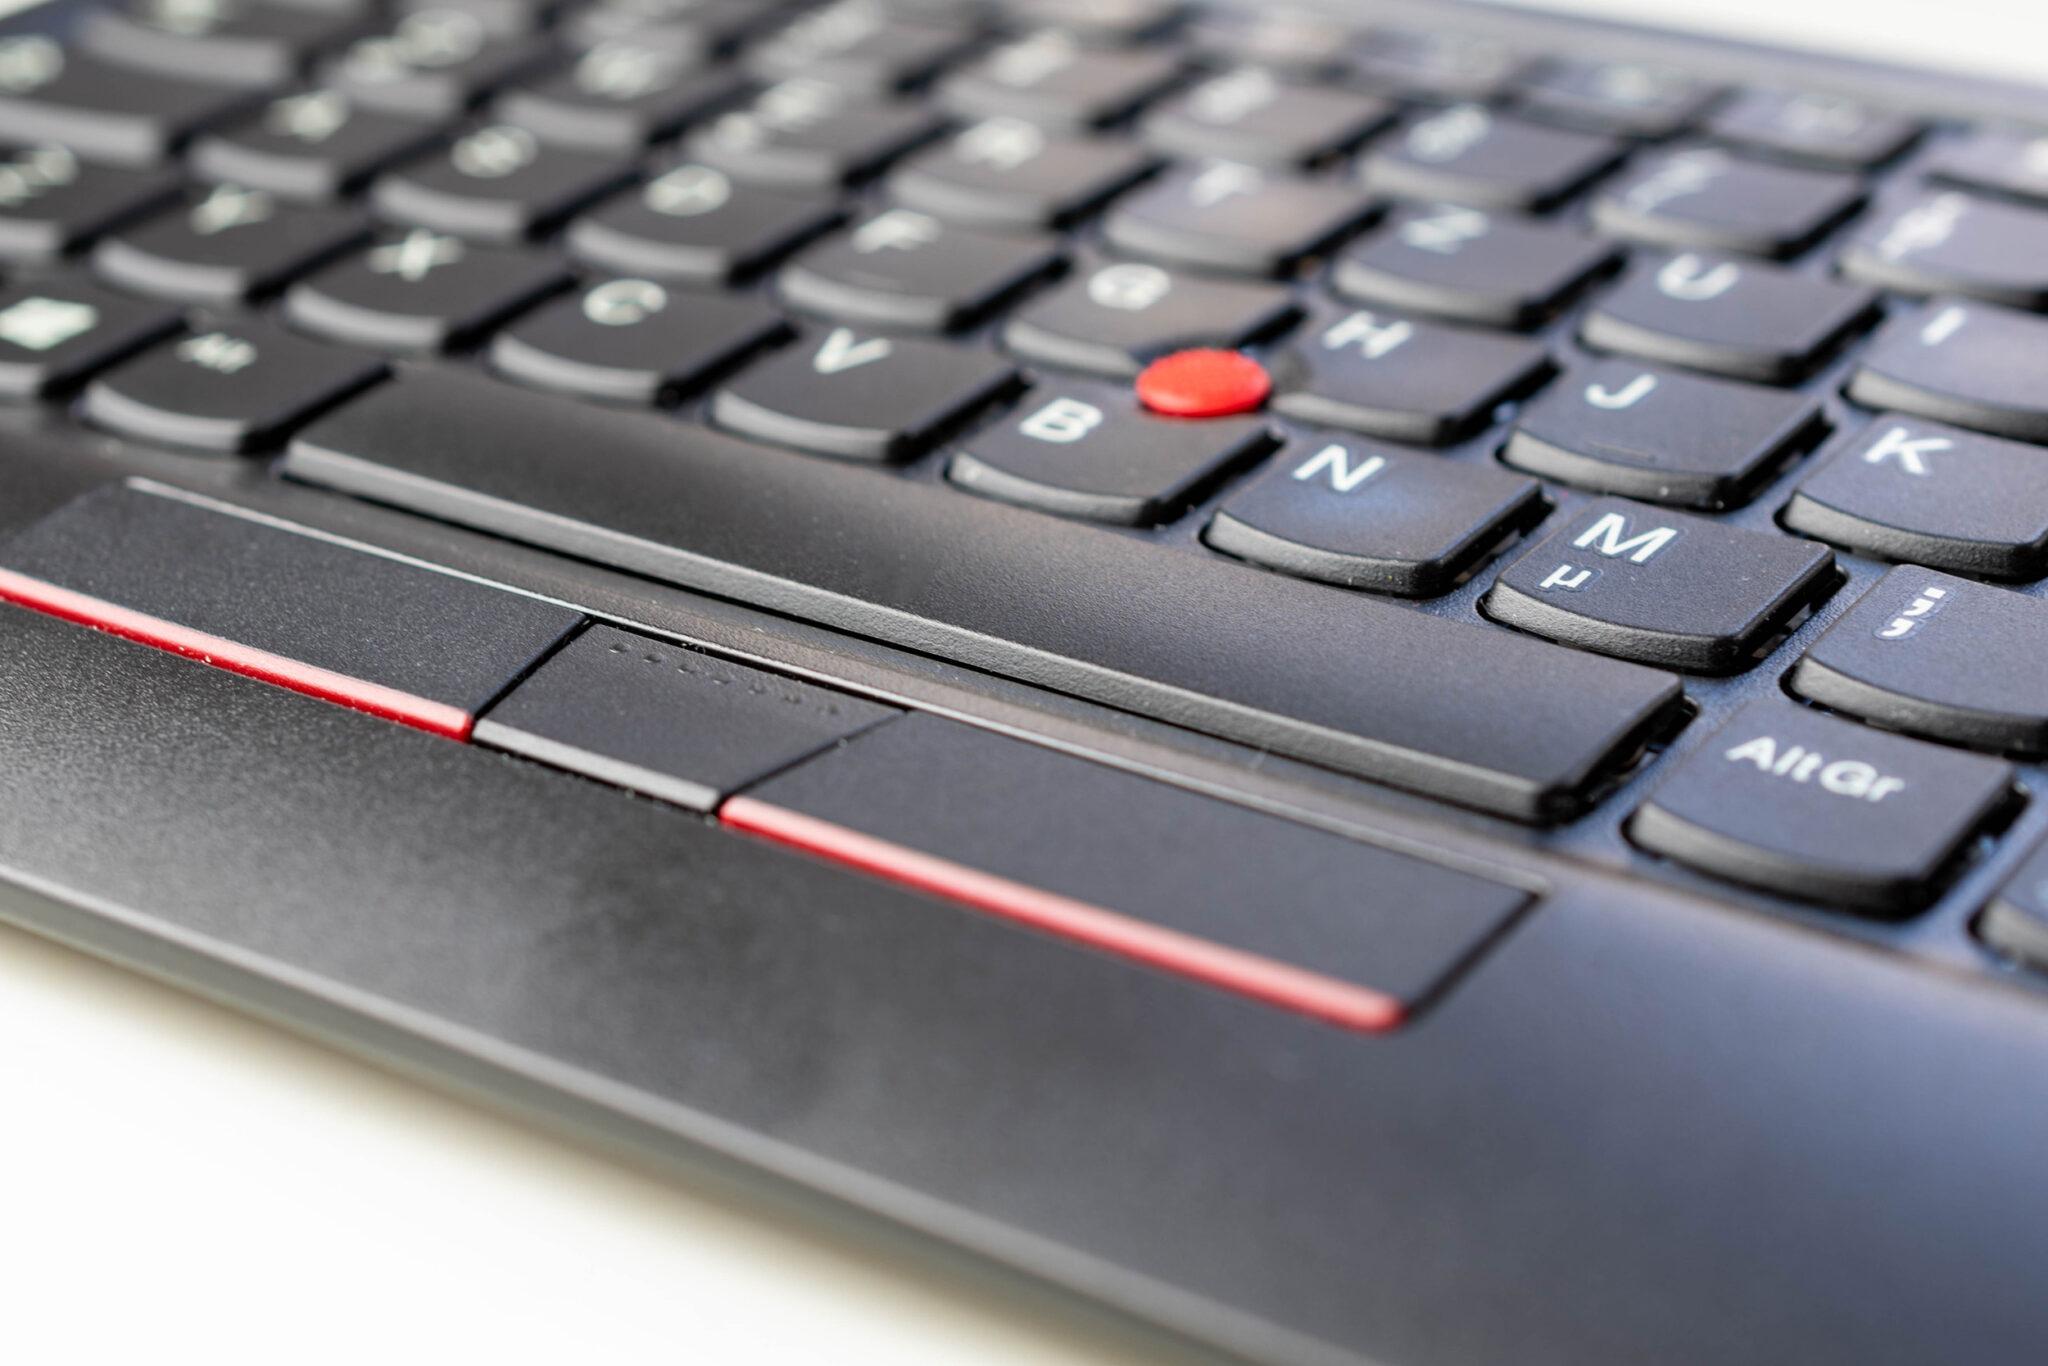 Lenovo ThinkPad TrackPoint Keyboard 2 Test